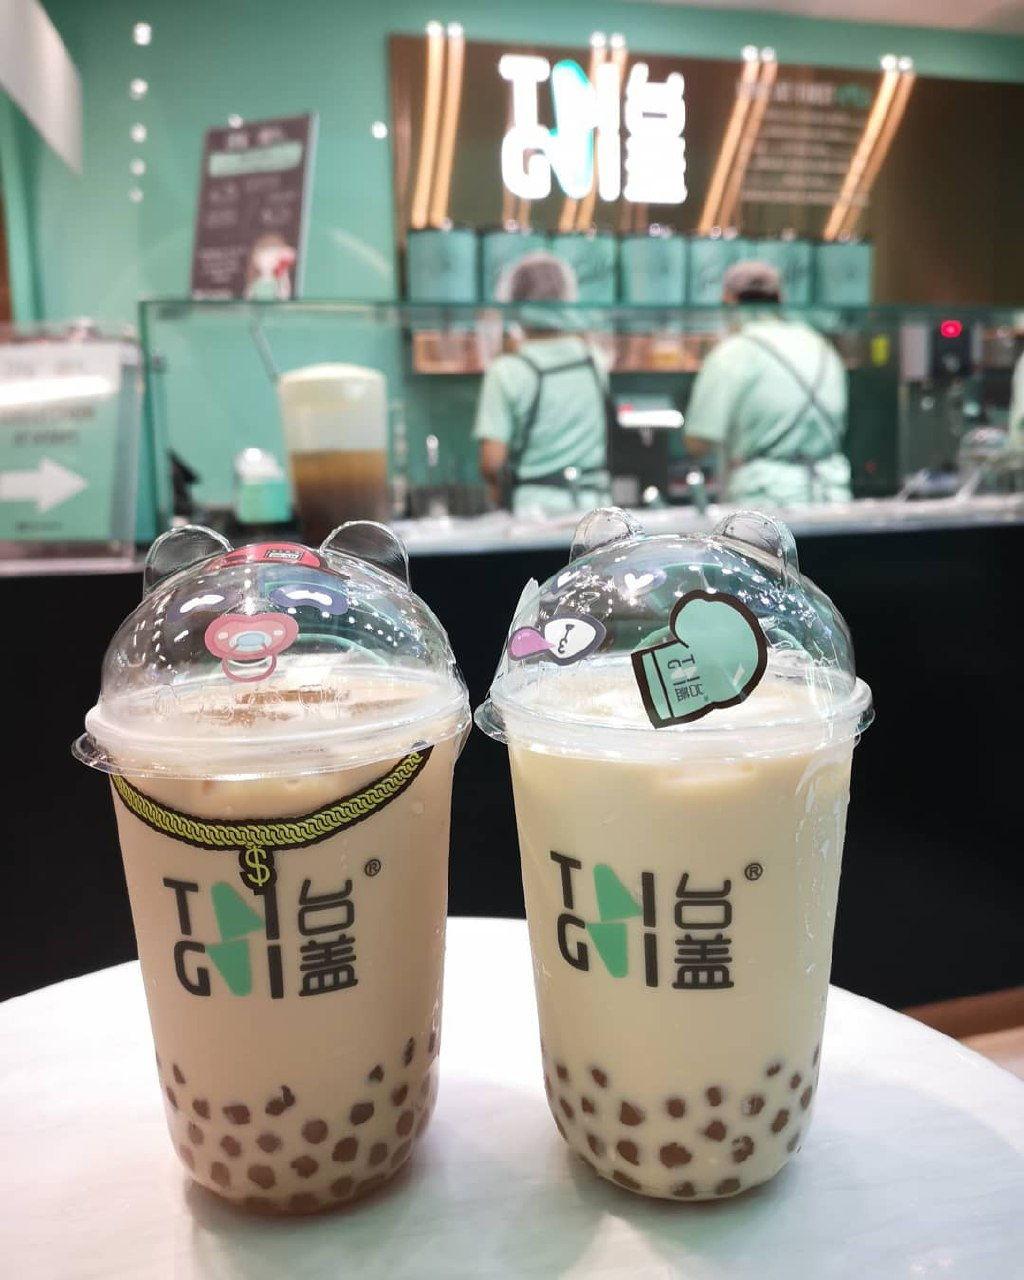 2-for- Beary Cute Milk Tea from Tai Gai